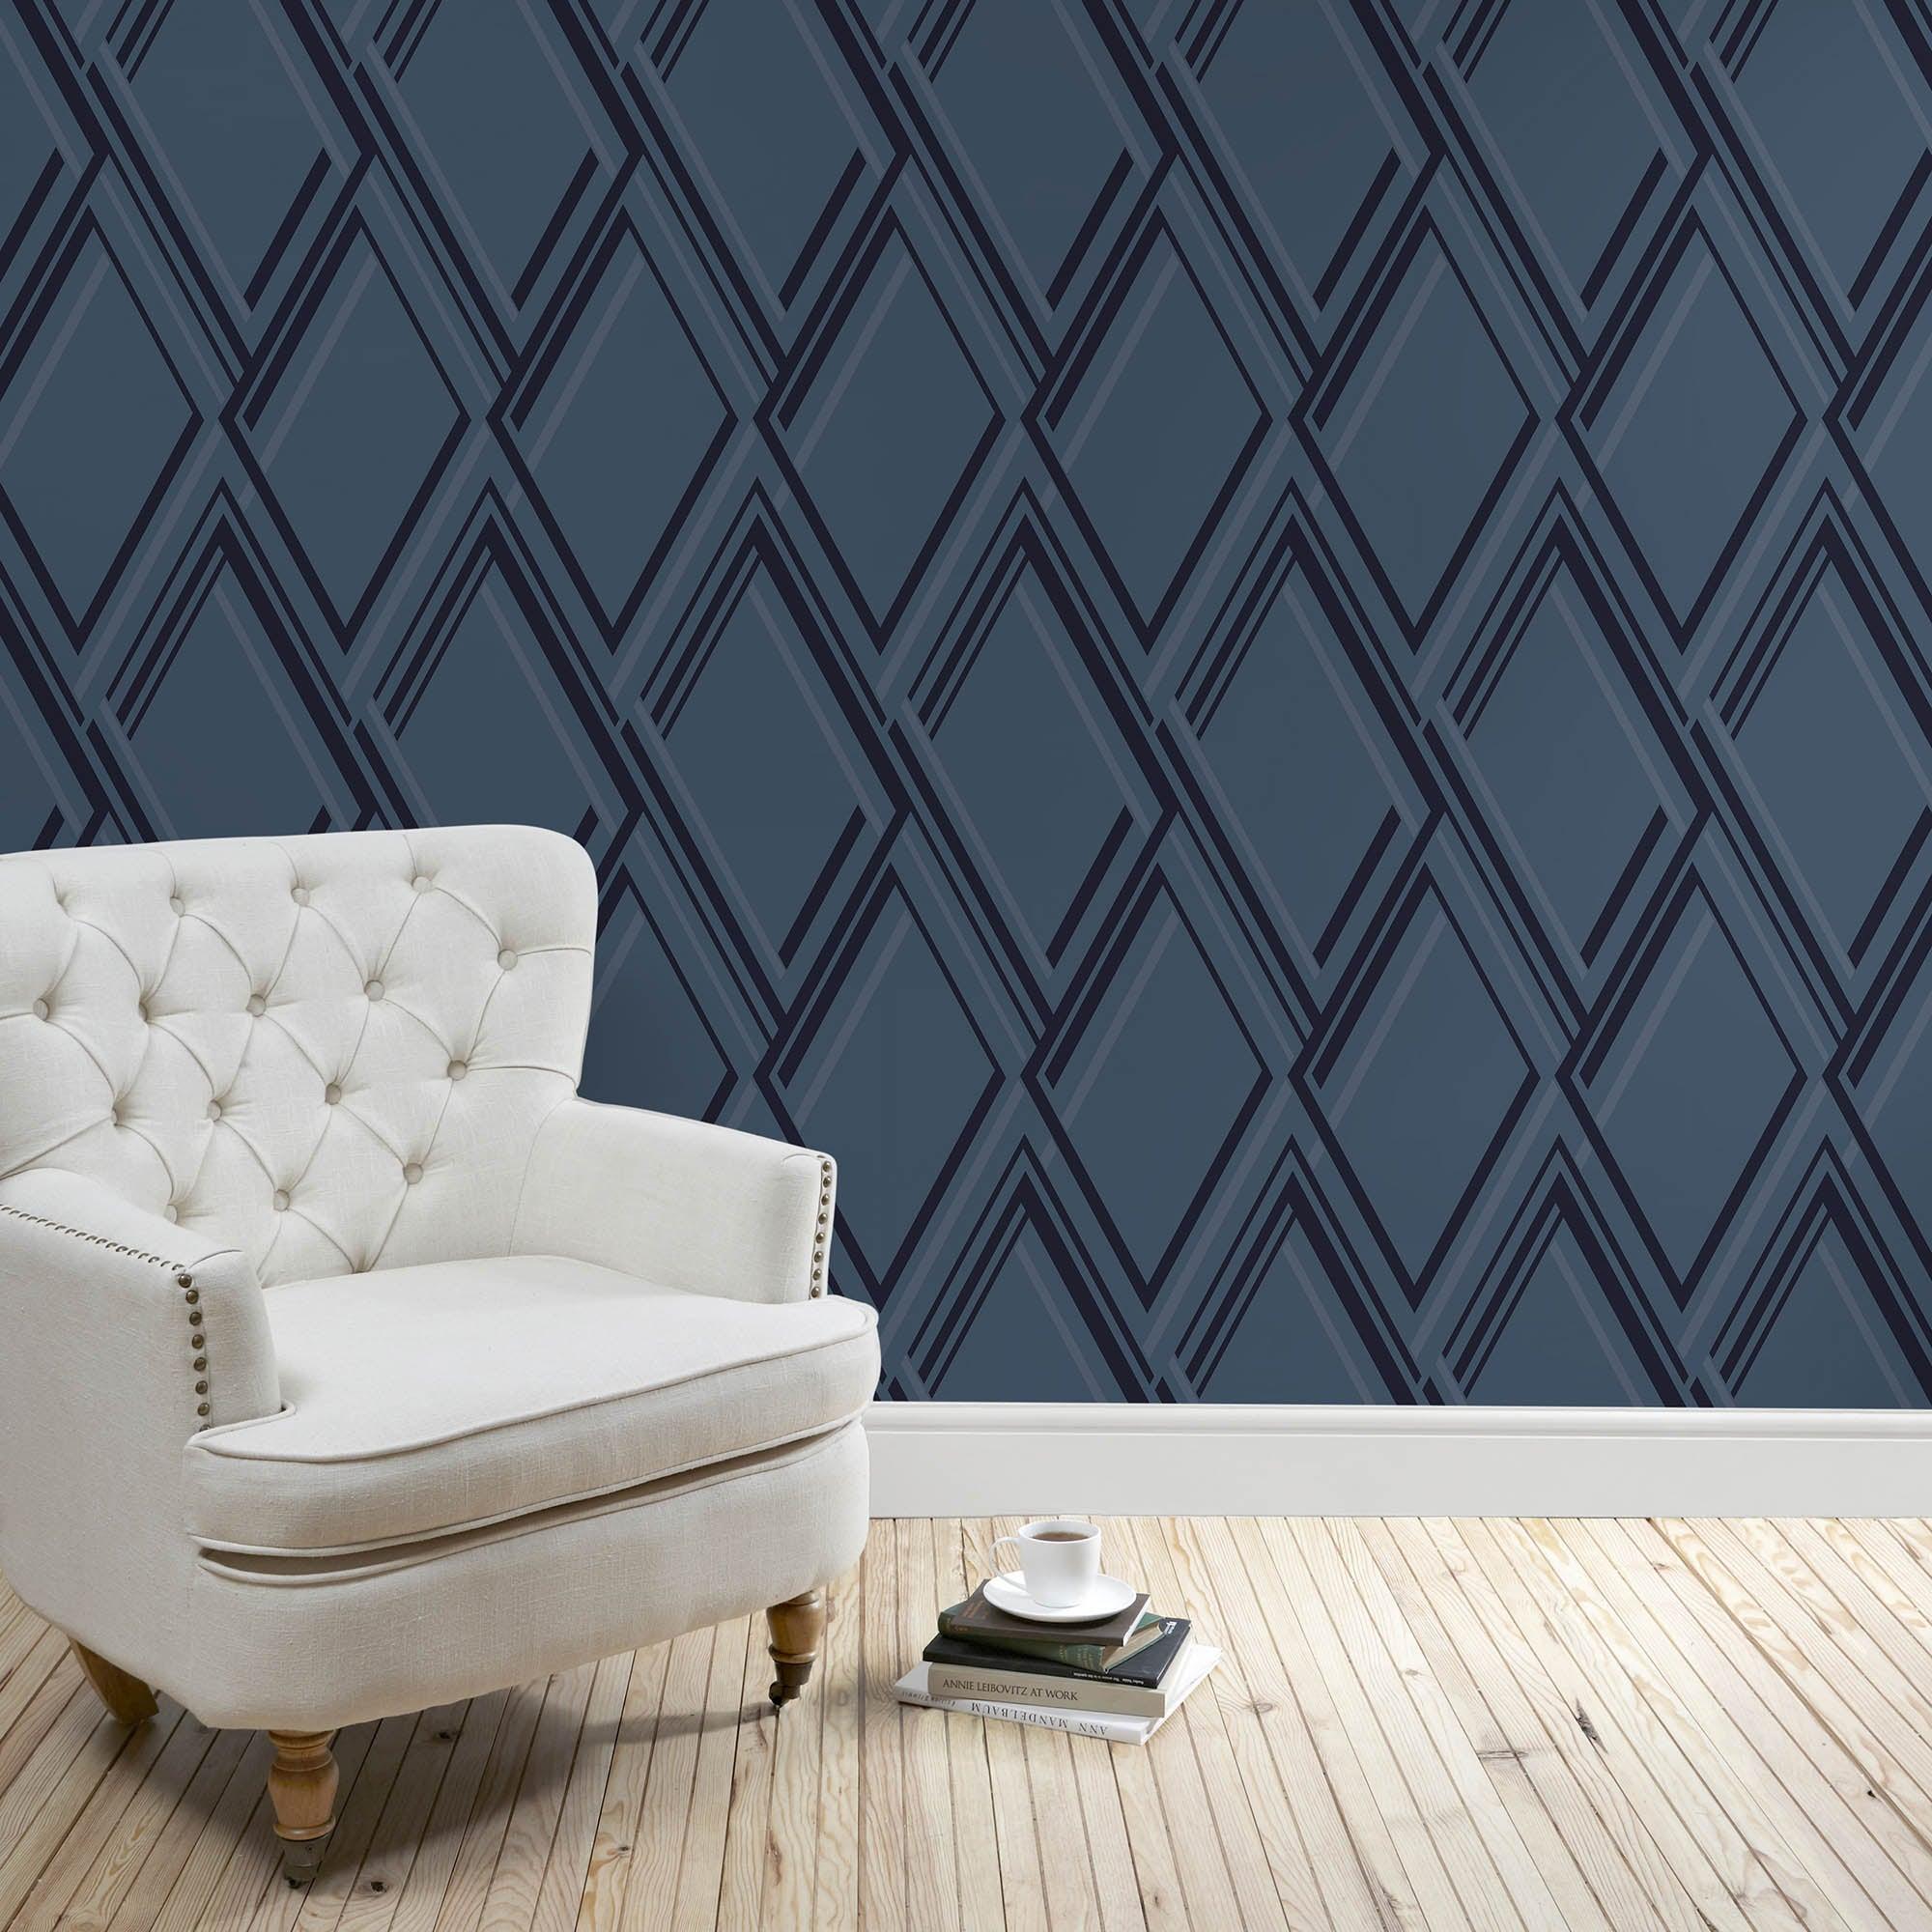 5A Fifth Avenue Midnight Blue Geo Wallpaper Midnight (Blue)